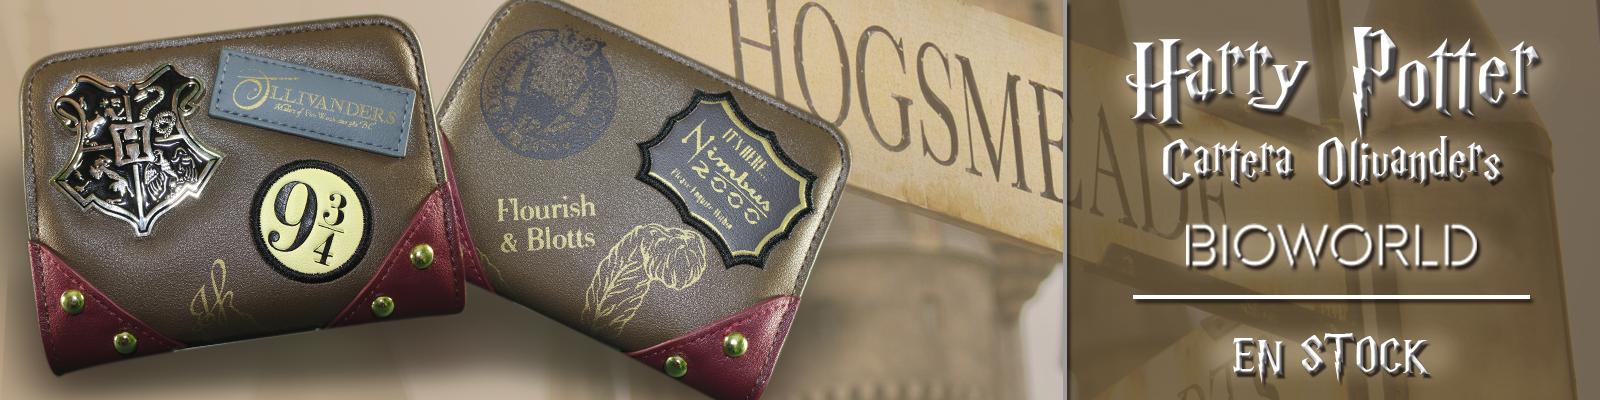 Cartera_Harry_Potter